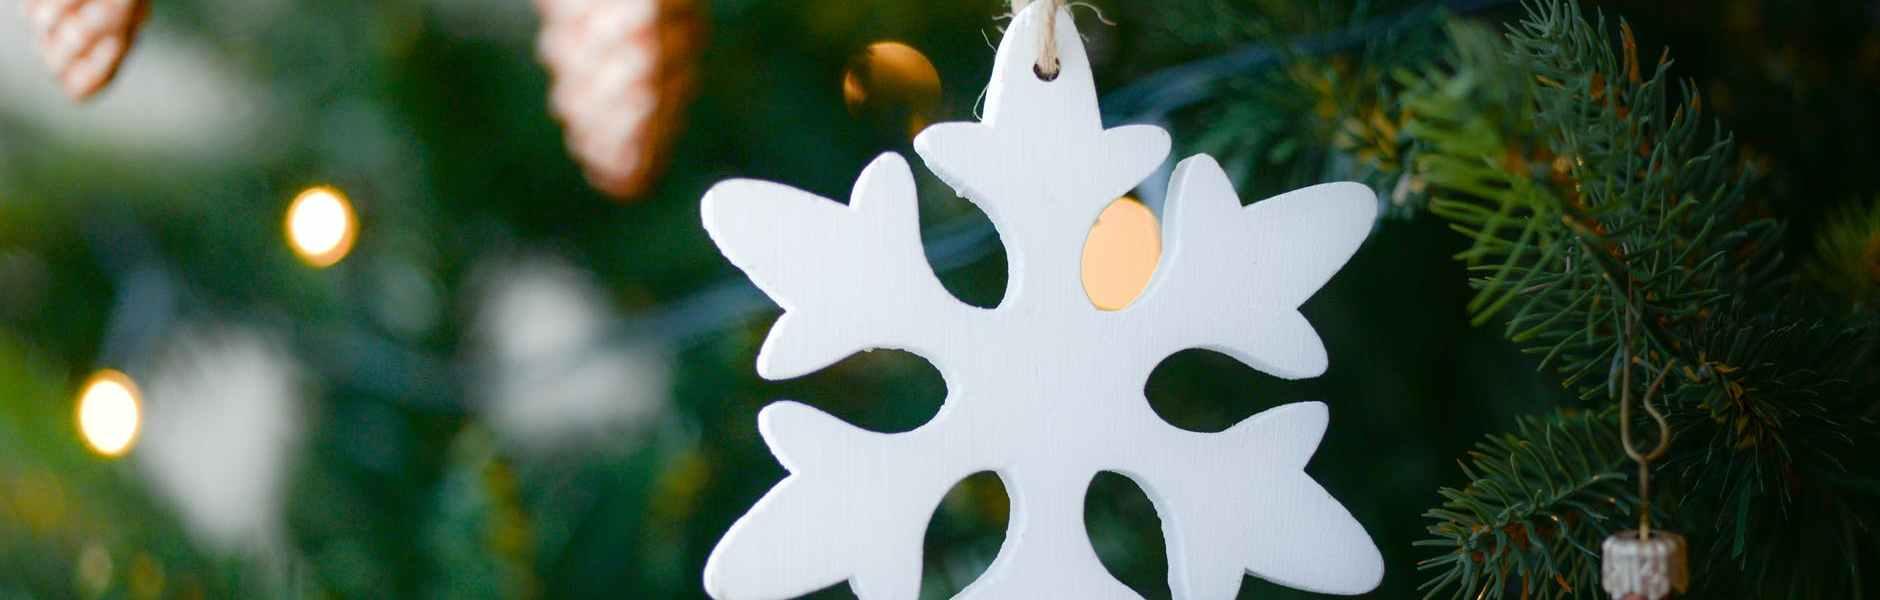 Kratki mjesečni horoskop za prosinac, white snow flake hanging on christmas tree